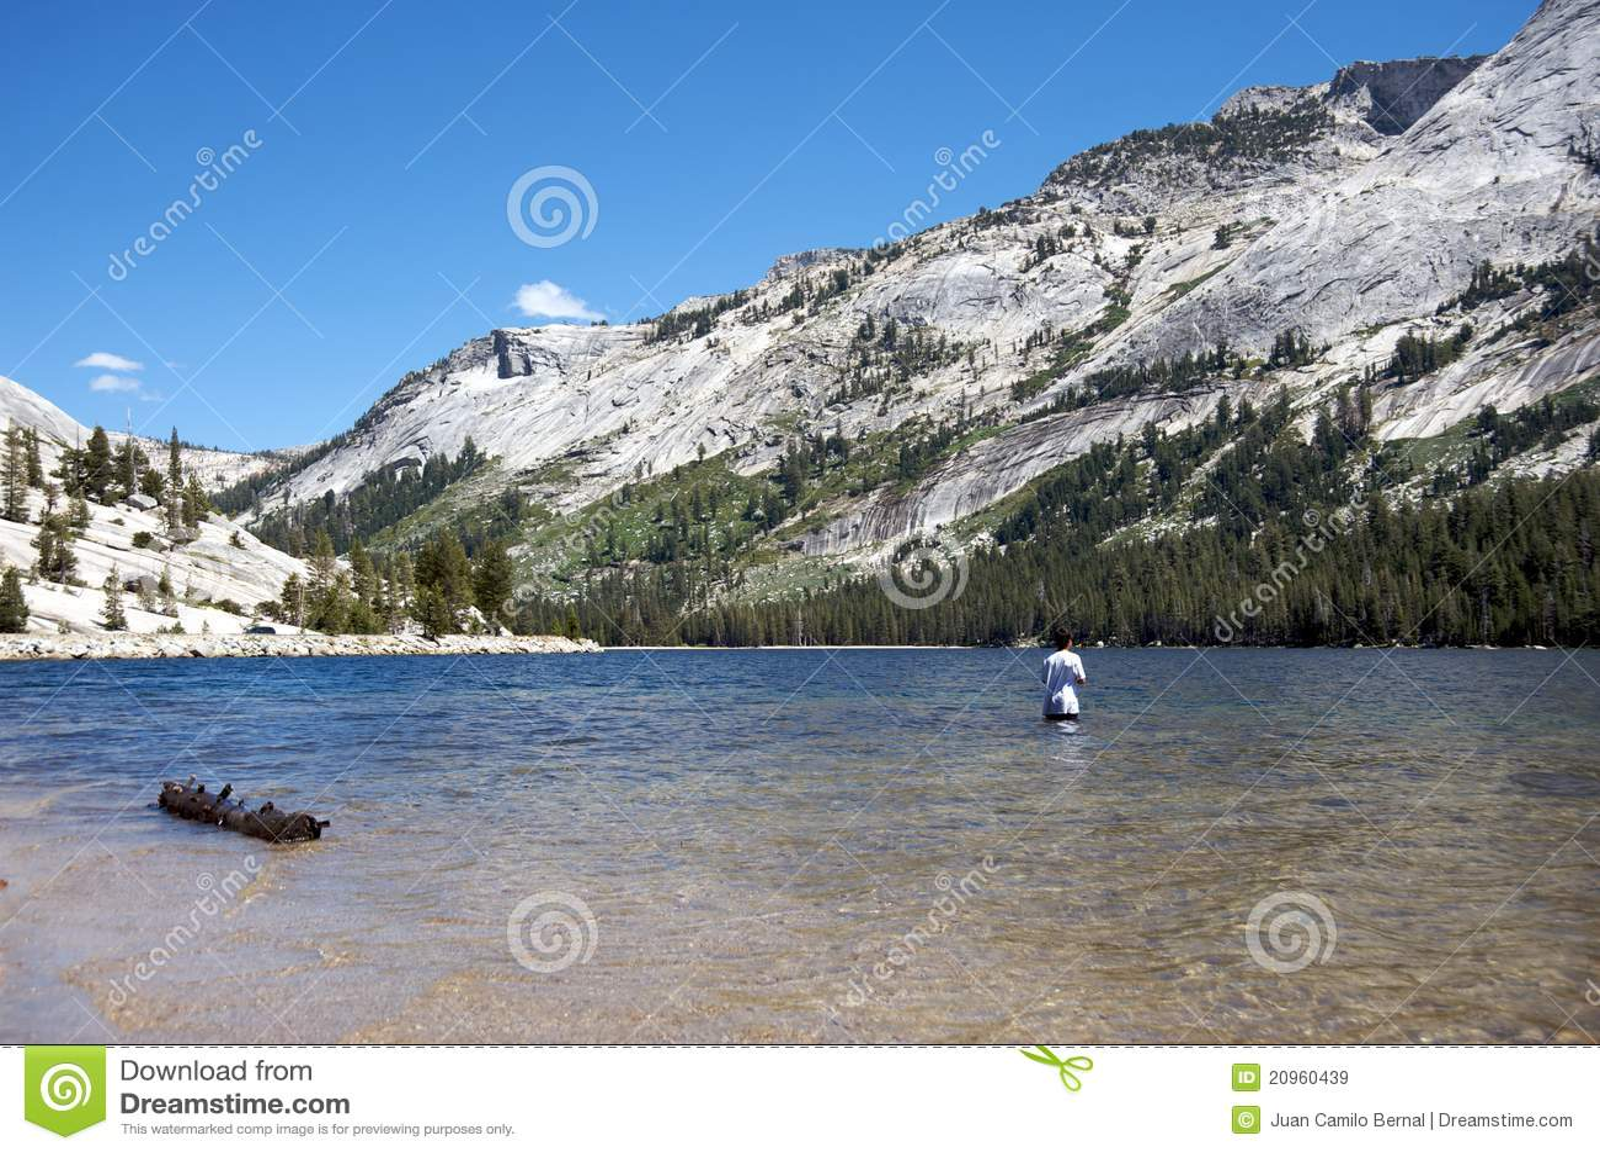 Teen fishing in yosemite royalty free stock images image for Fishing in yosemite